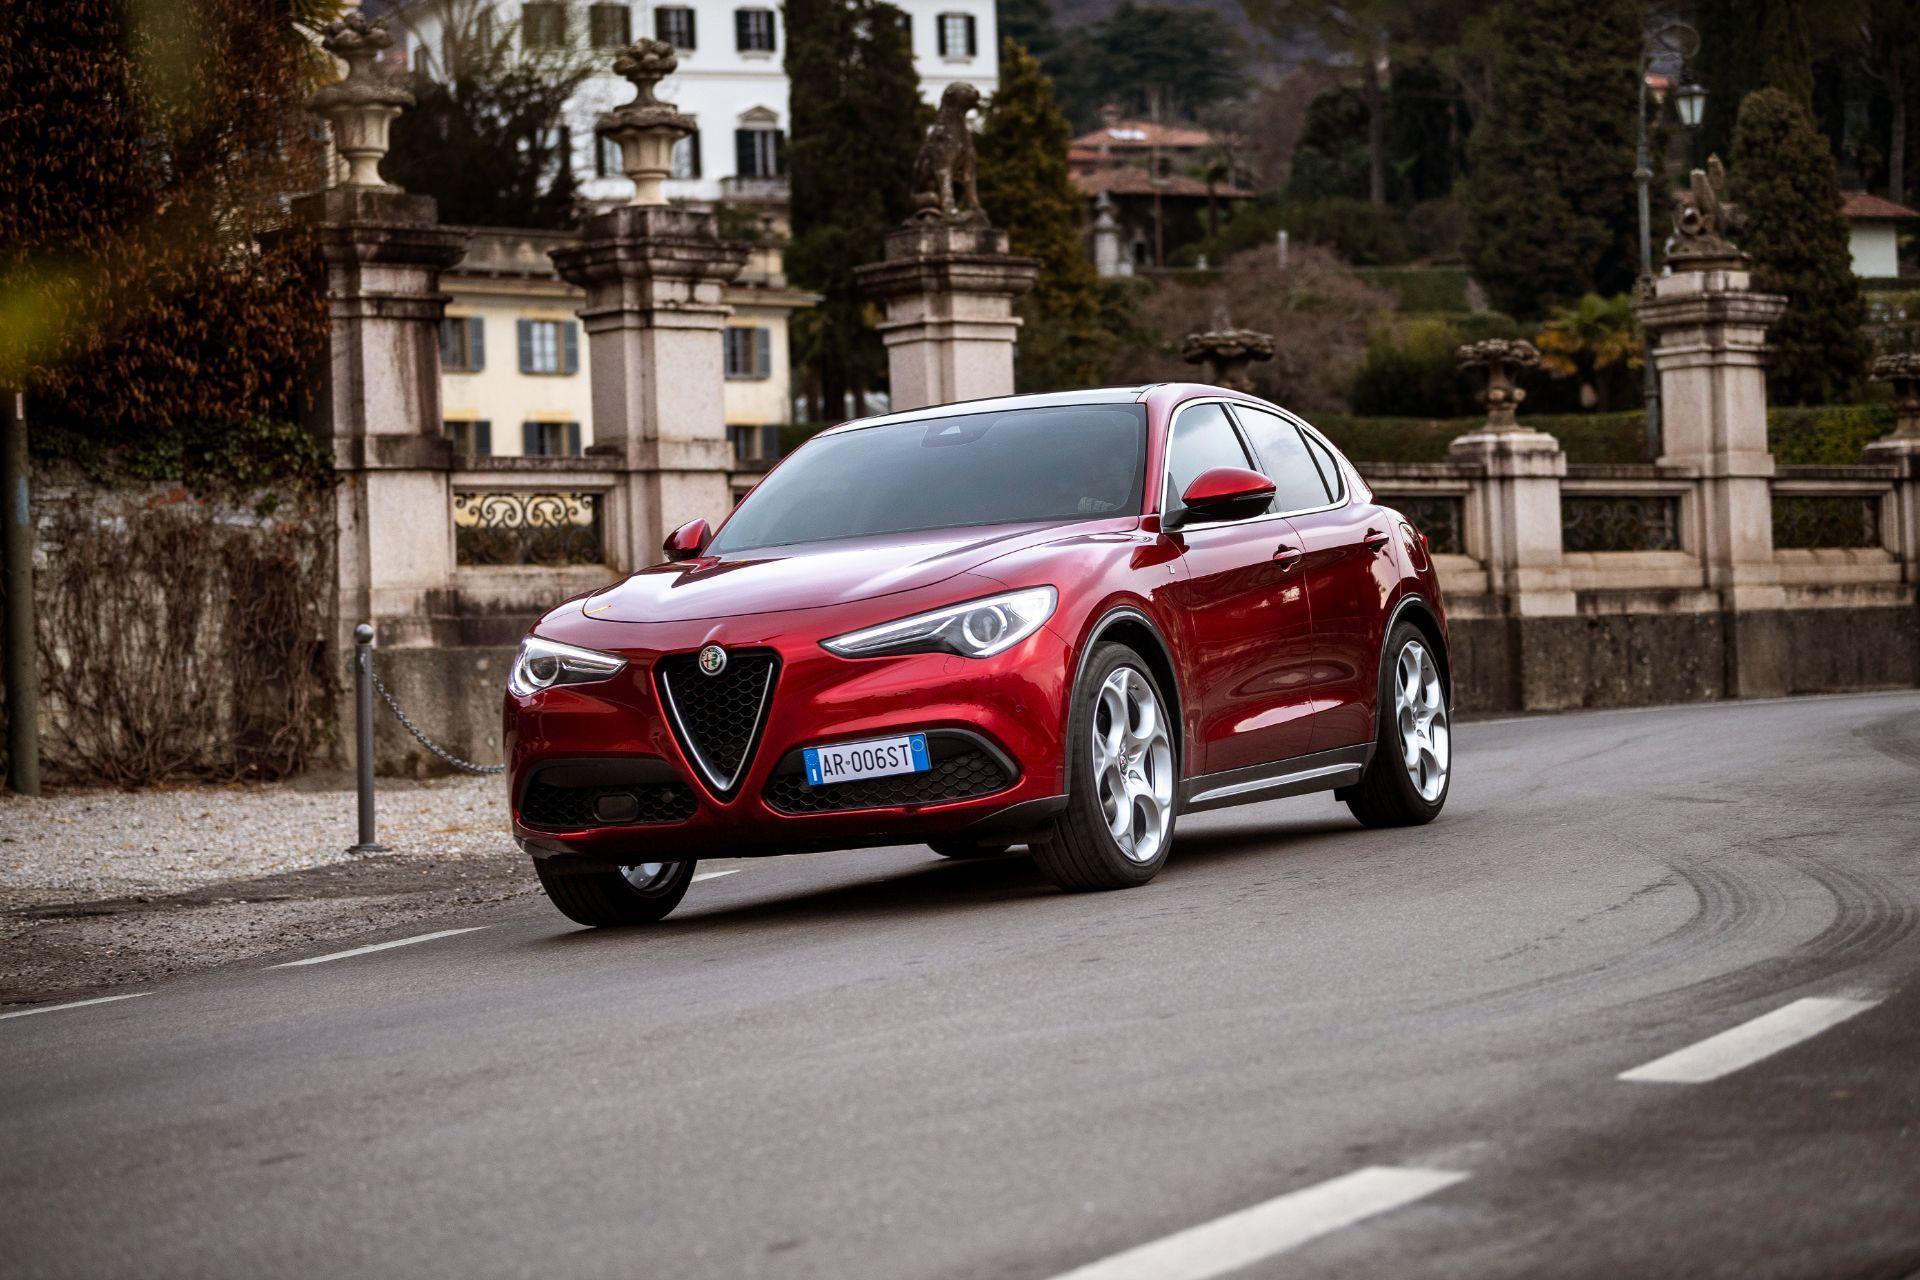 Alfa-Romeo-Giulia-and-Stelvio-6C-Villa-dEste-5